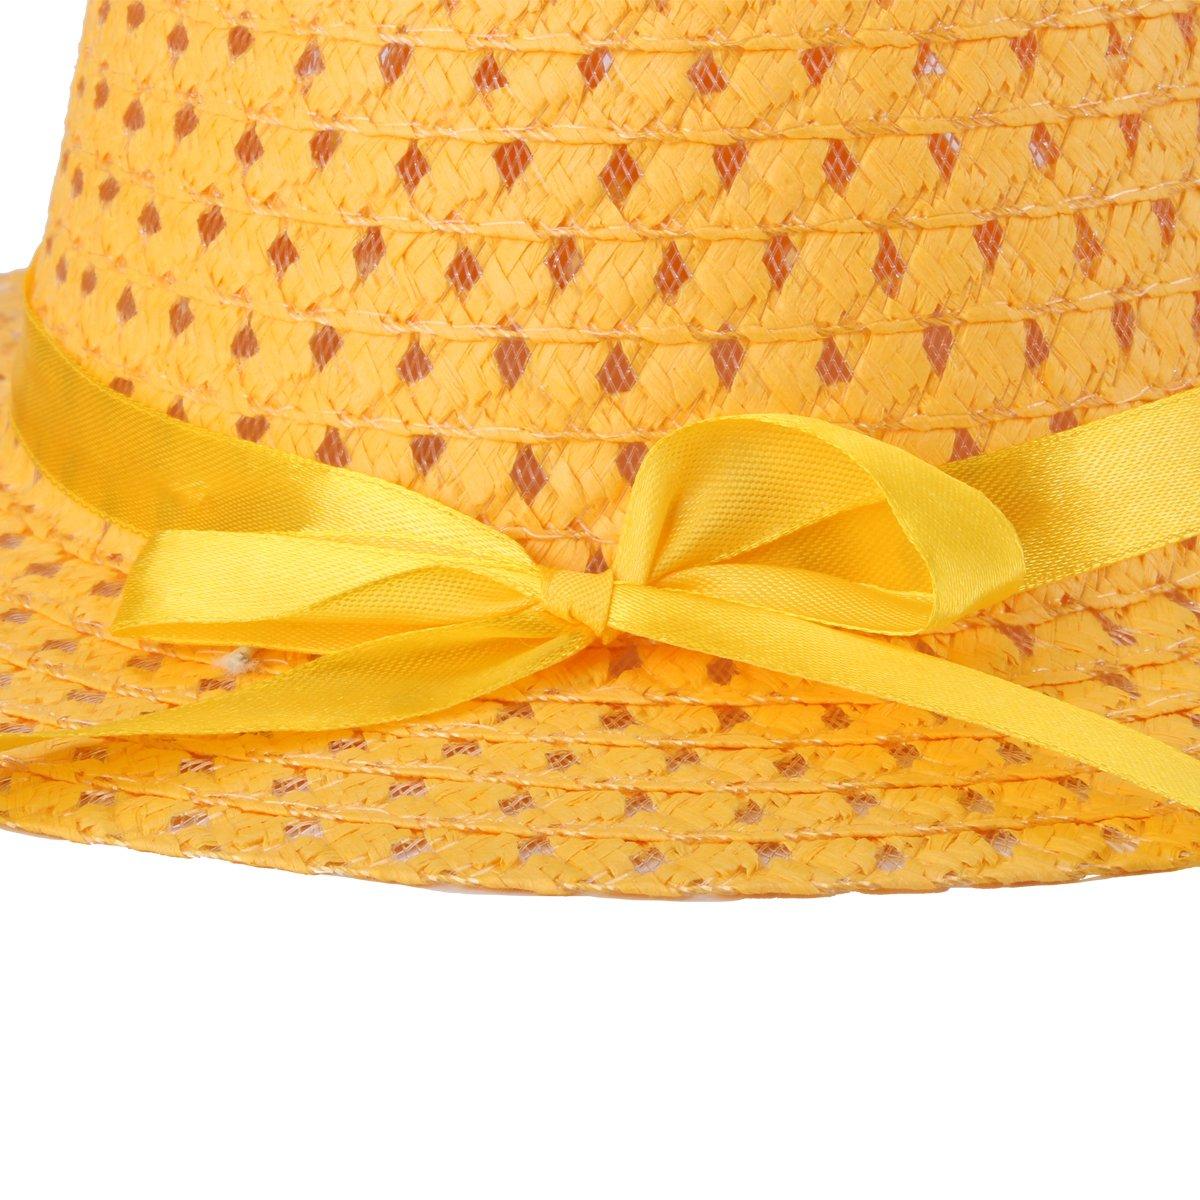 Girls Sun Hat Straw Summer/Hats/for/Kids Floppy Beach Cap with Purse